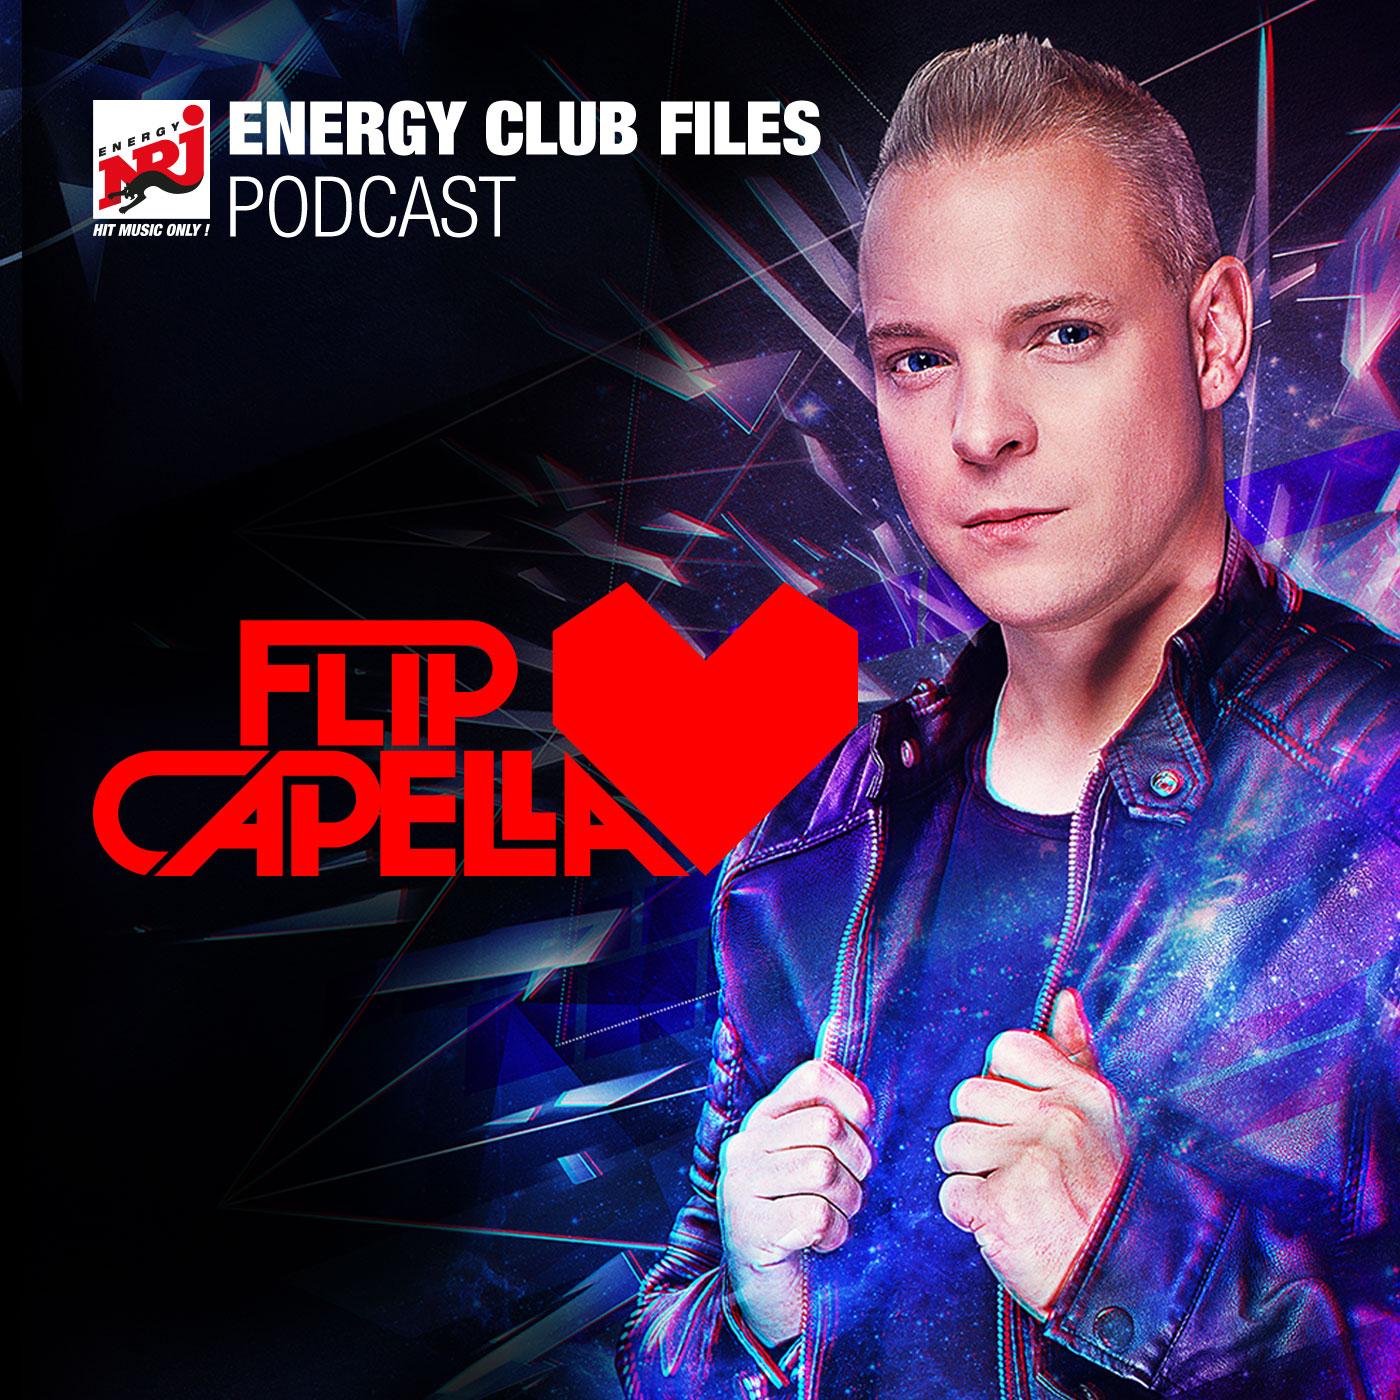 ENERGY Club Files Podcast - Flip Capella